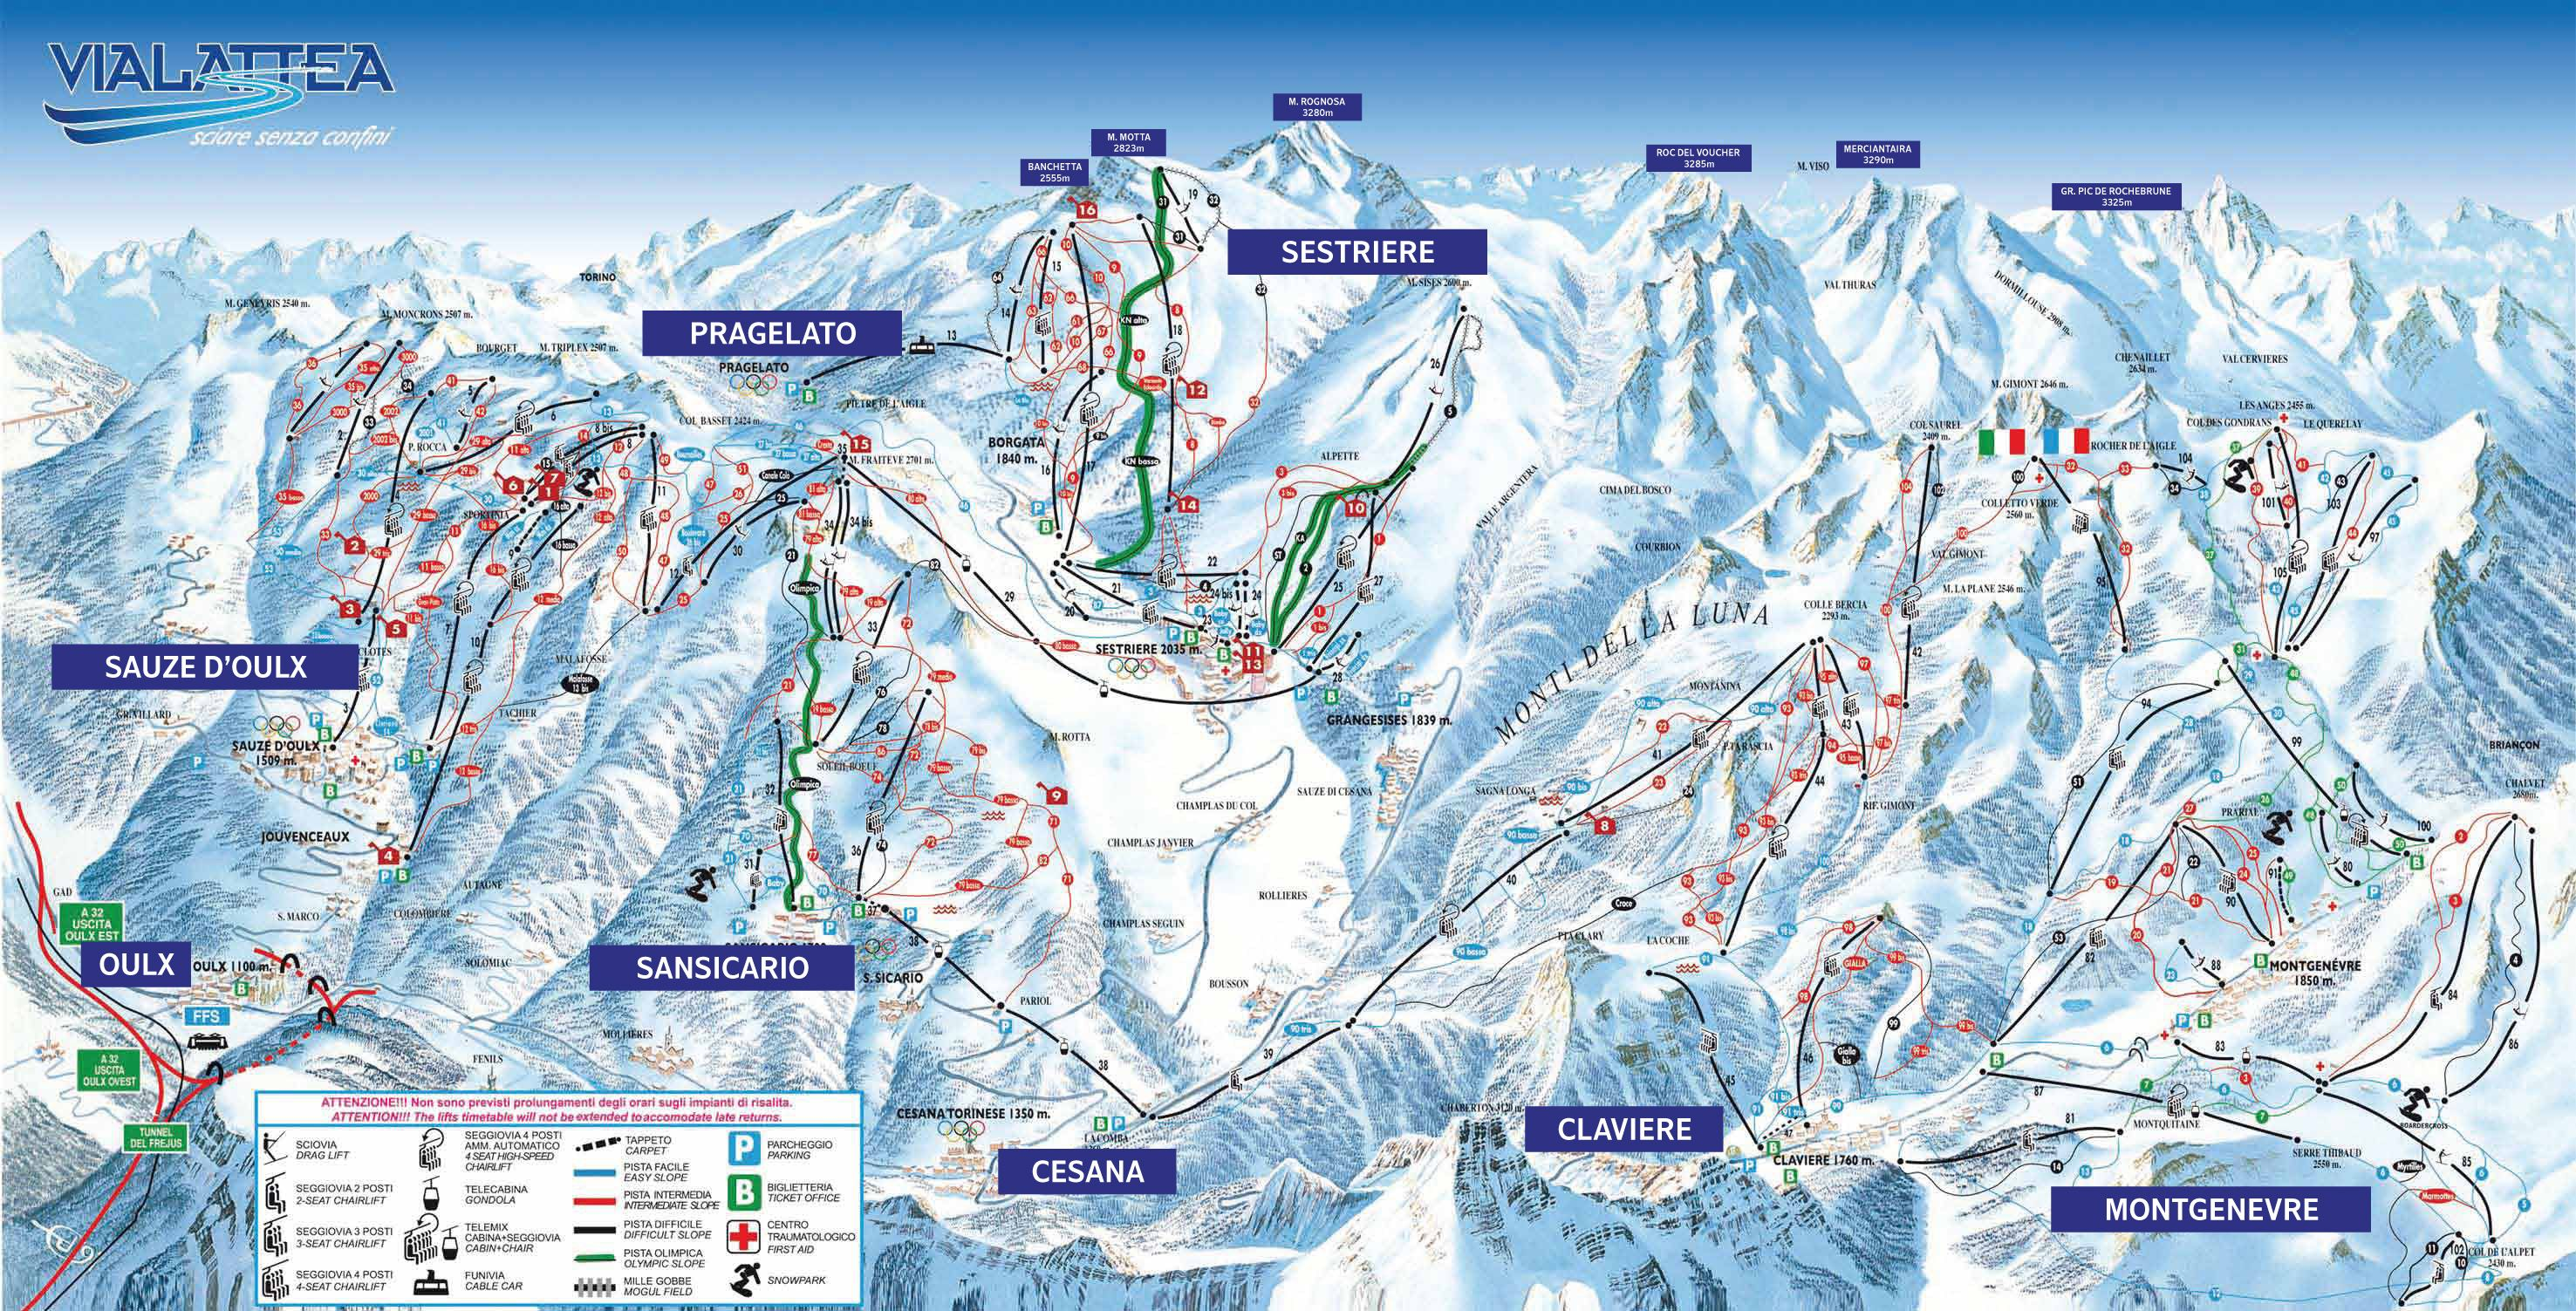 13032016 Italy Sauze DOulx Neilson Edelweiss Vialattea Ski